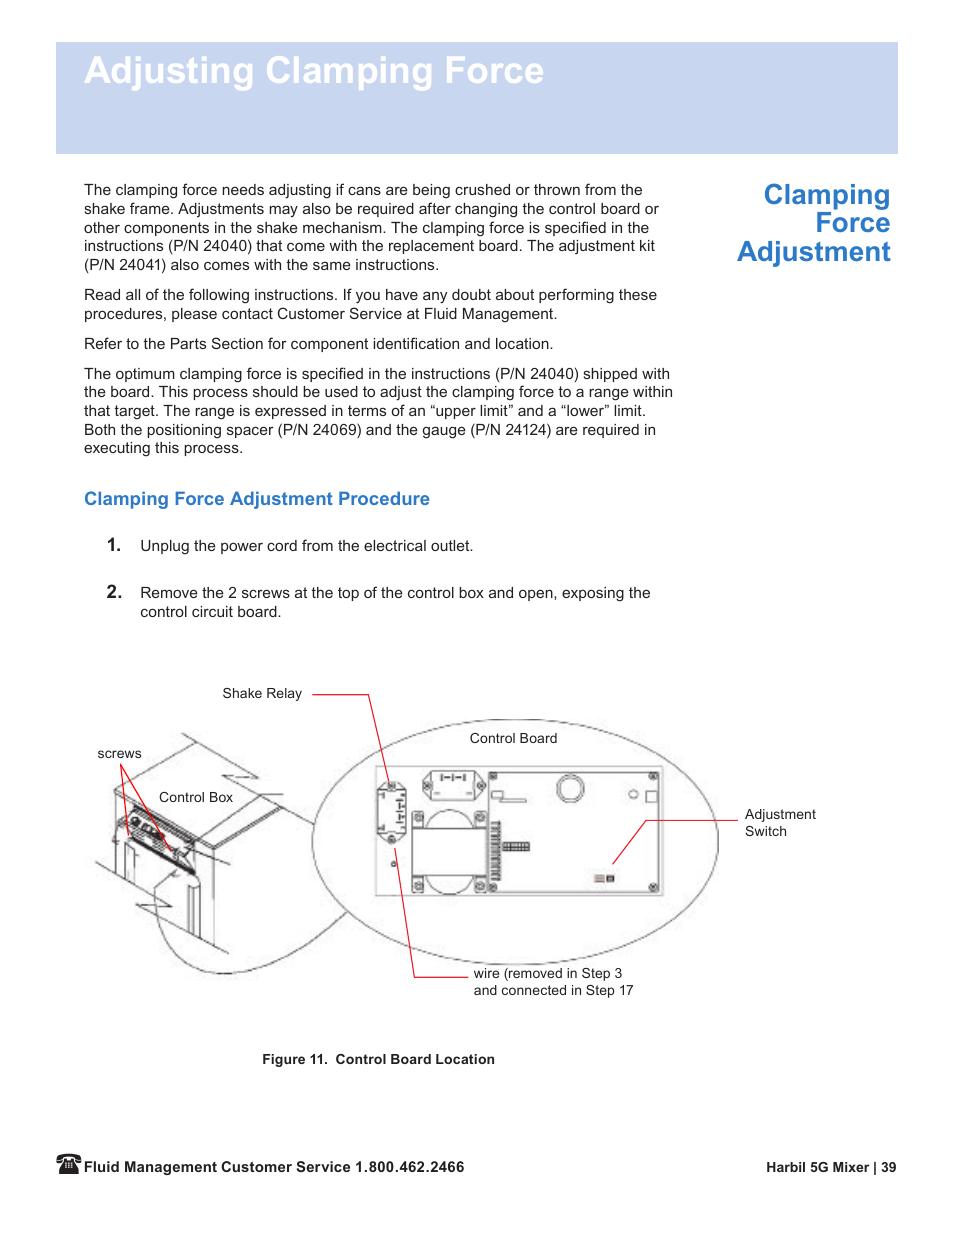 Adjusting clamping force, Clamping force adjustt | Fluid ...